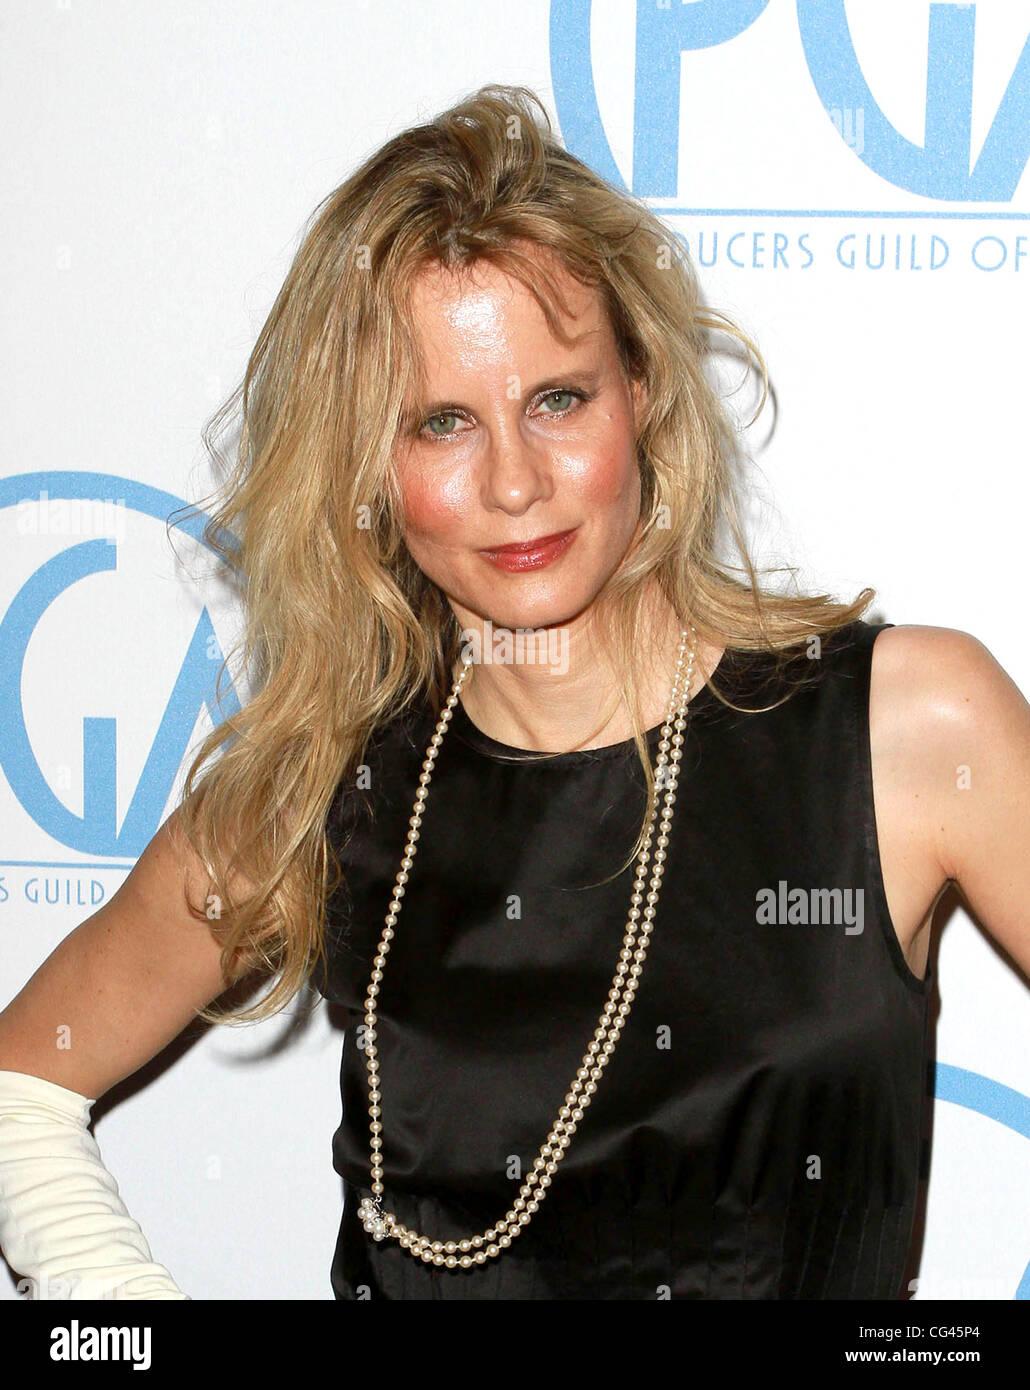 Lori Singer nude (75 foto and video), Pussy, Cleavage, Selfie, lingerie 2006